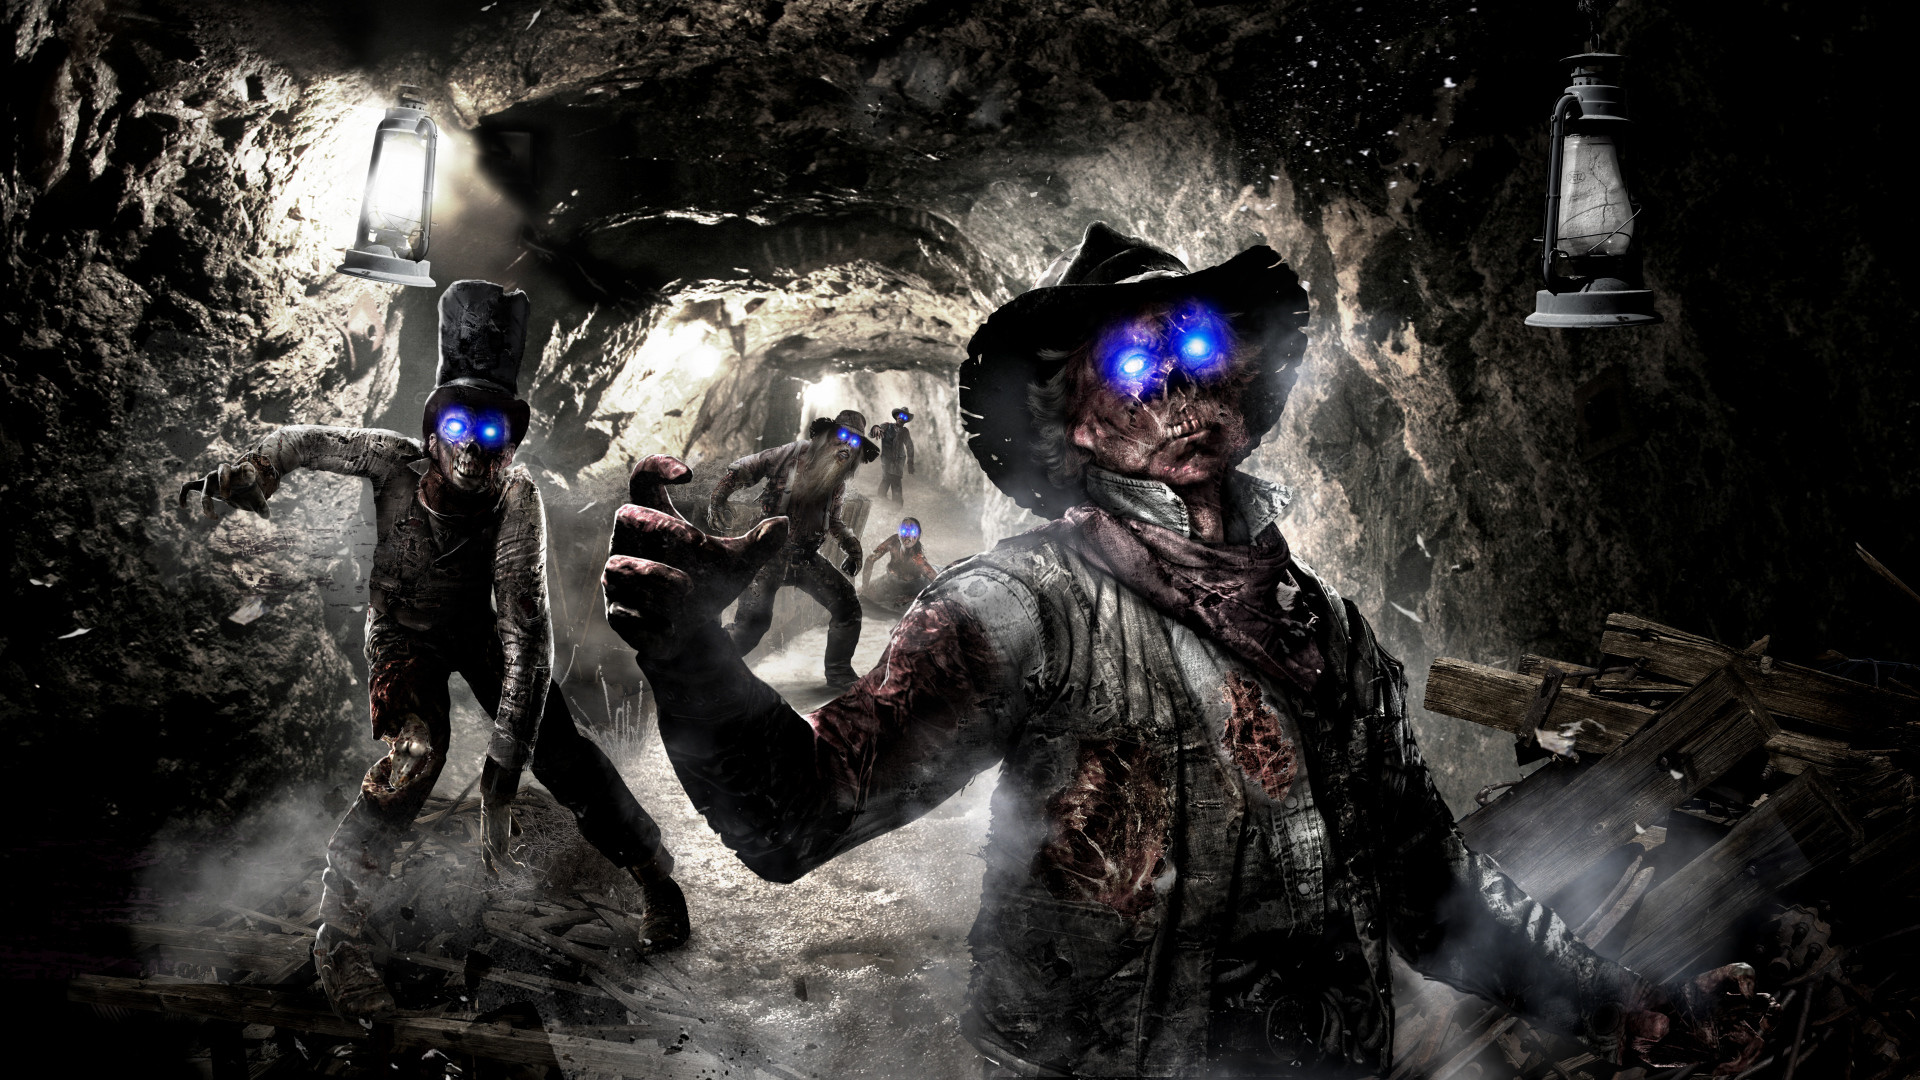 Black Ops Zombies Wallpaper 1080p Wallpapertag